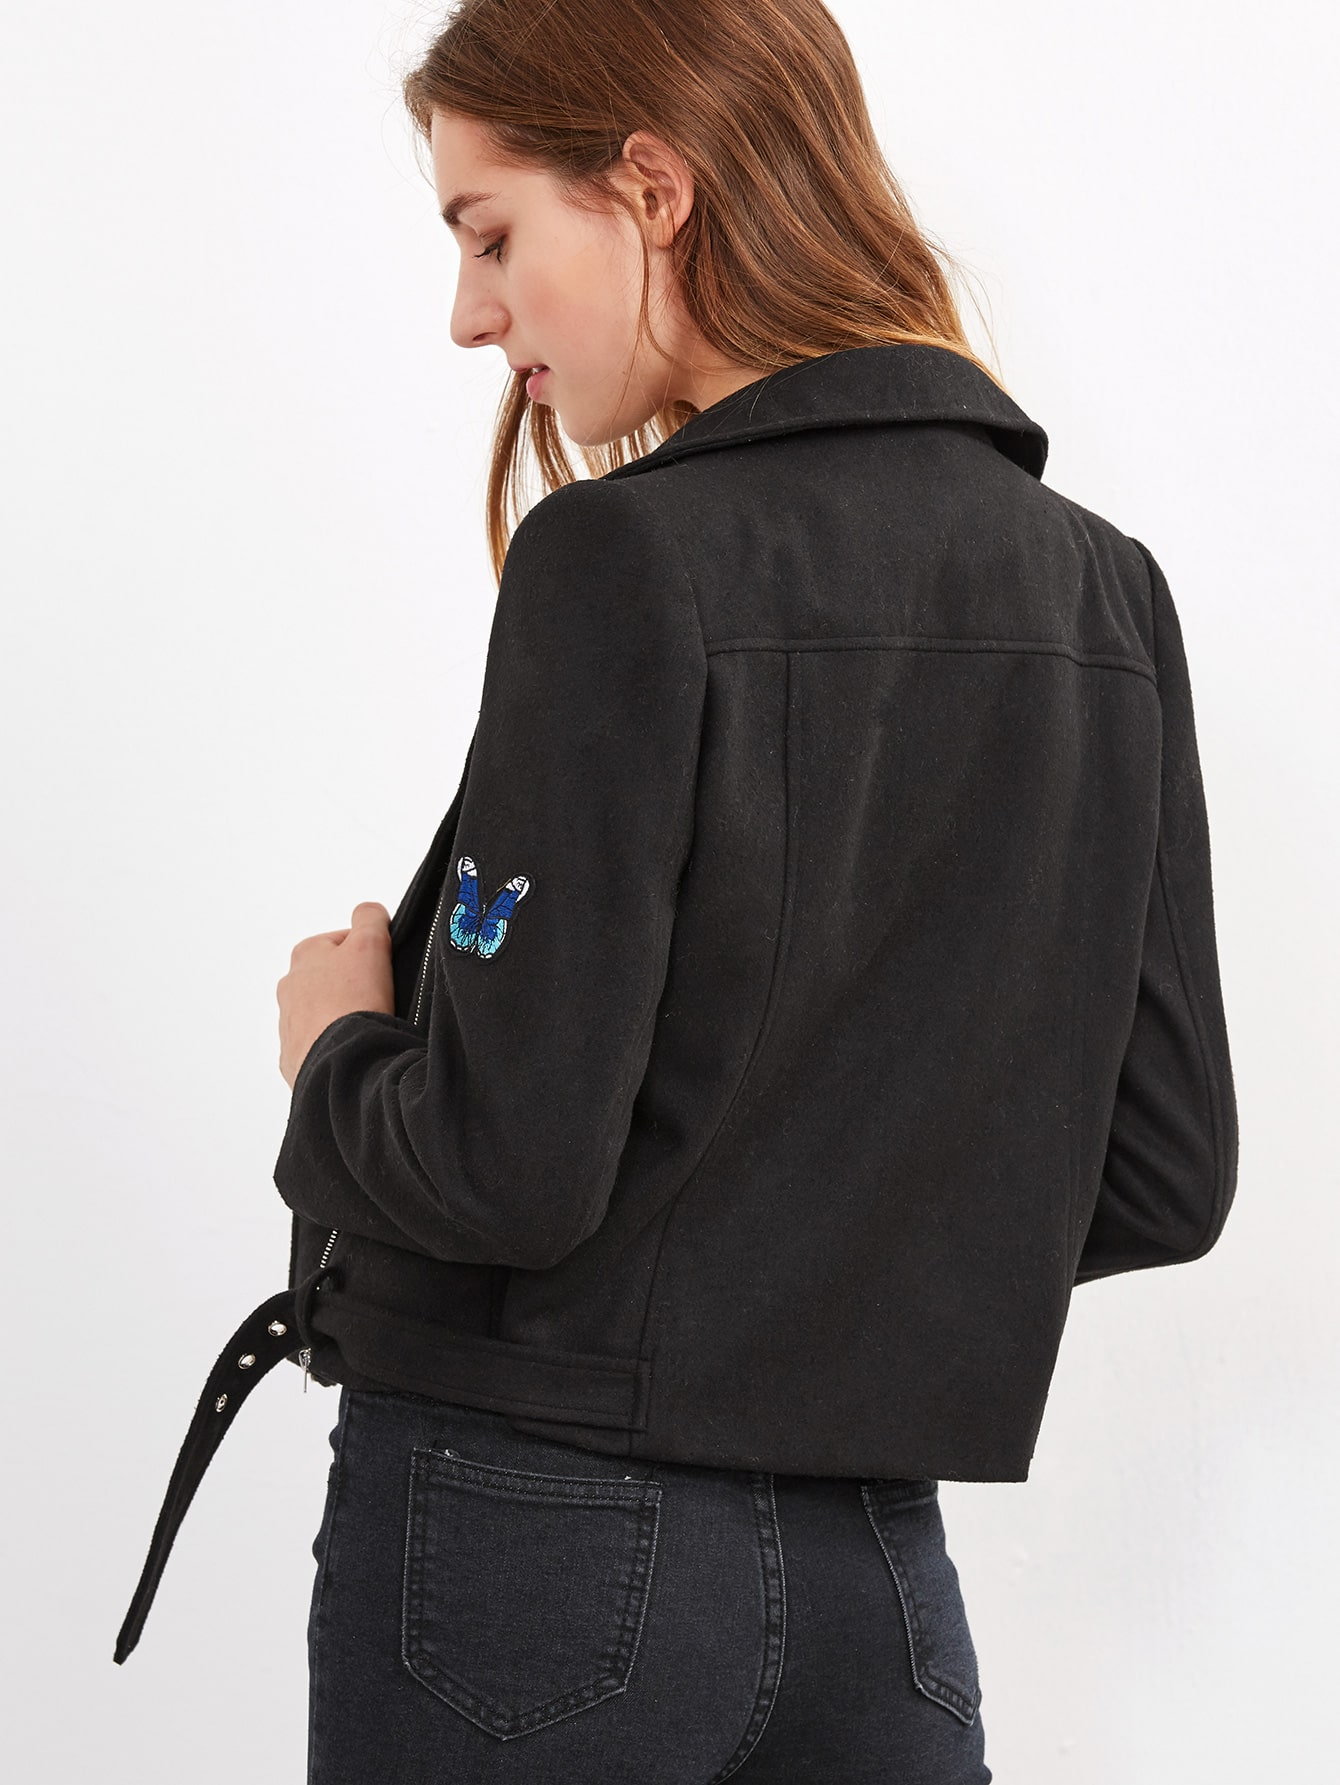 jacket161018704_1 - 副本